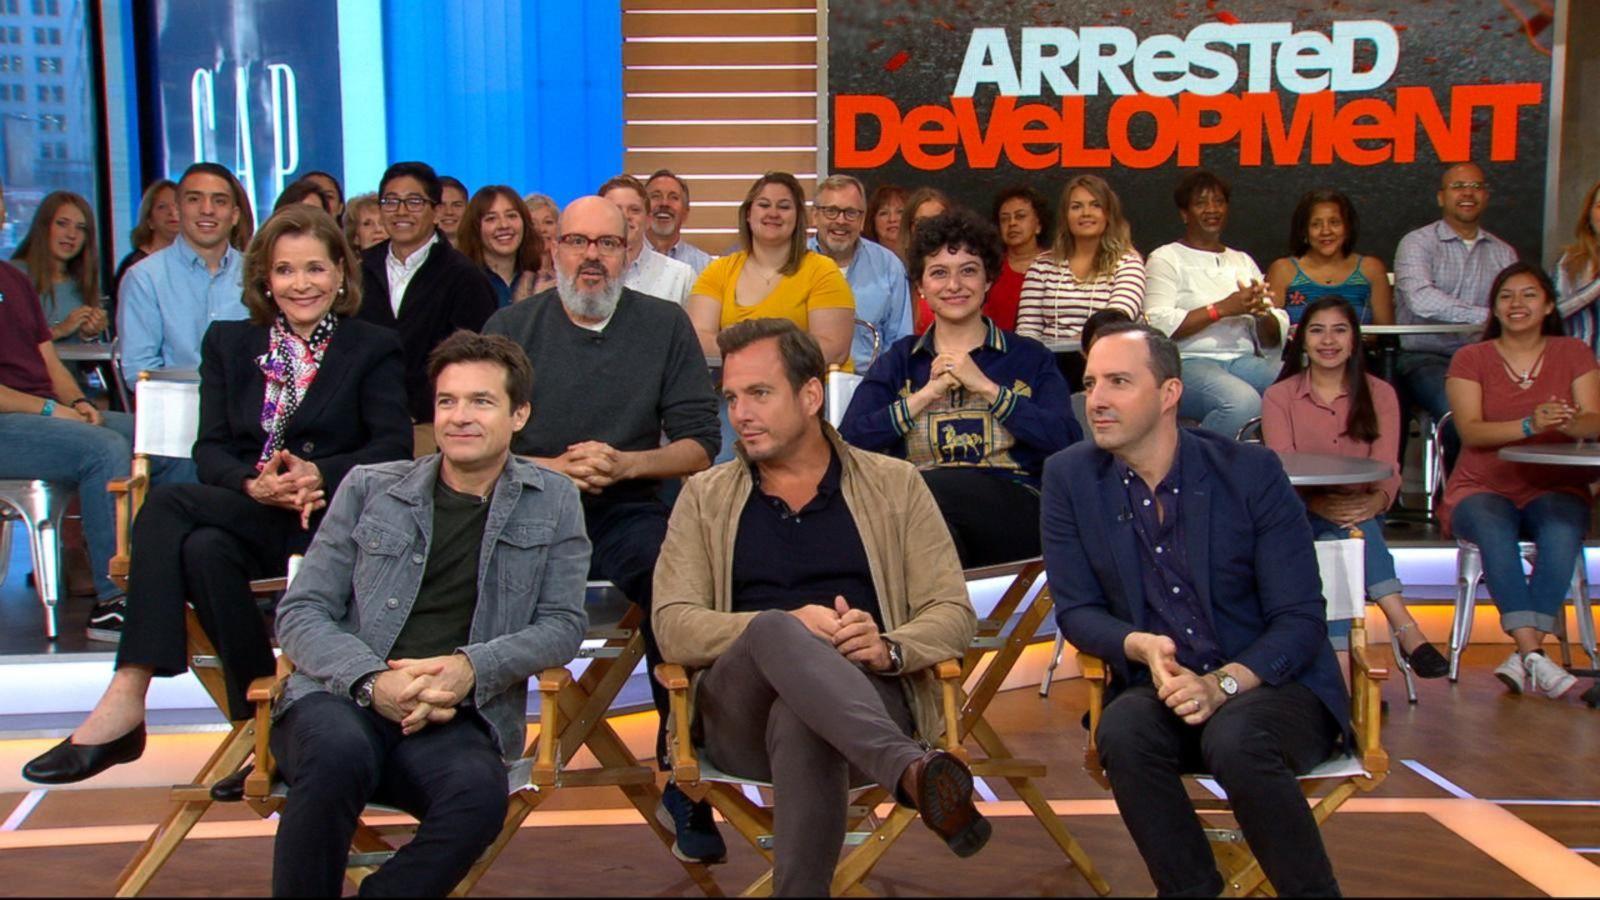 Will there be an \'Arrested Development\' musical? Jason Bateman opens ...